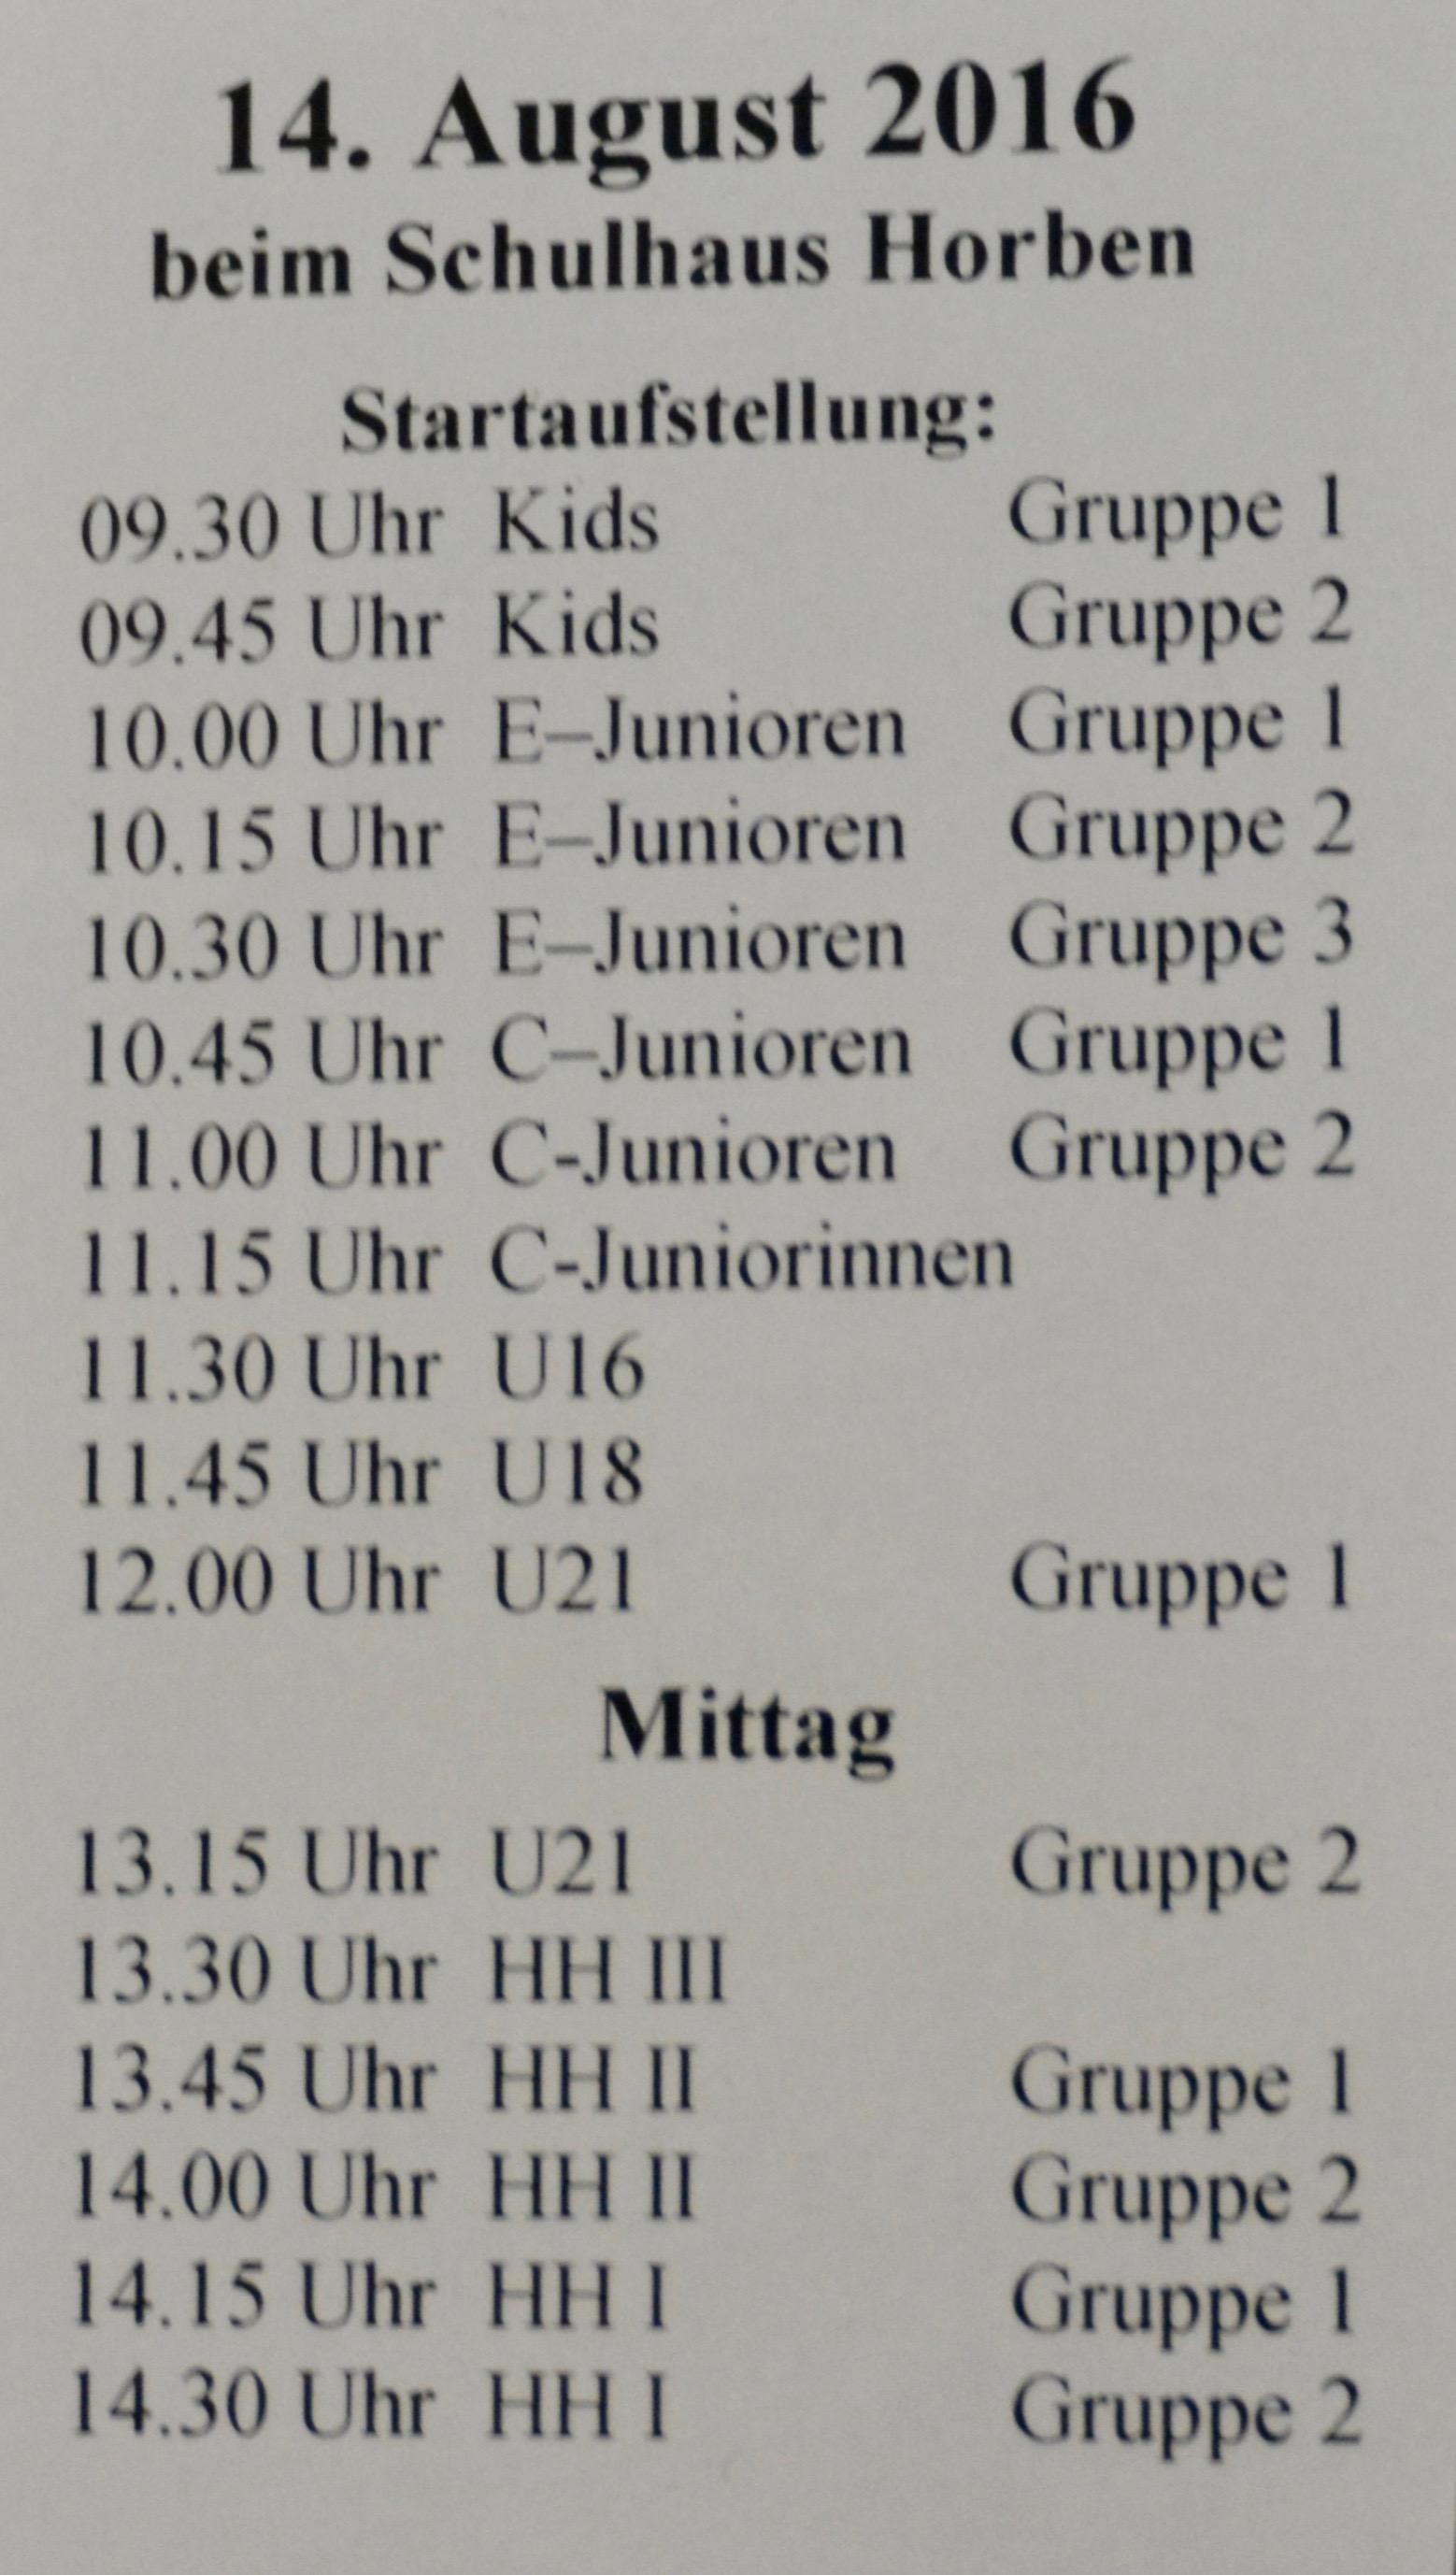 Verein - Sponsorenlauf Saison 2016/17